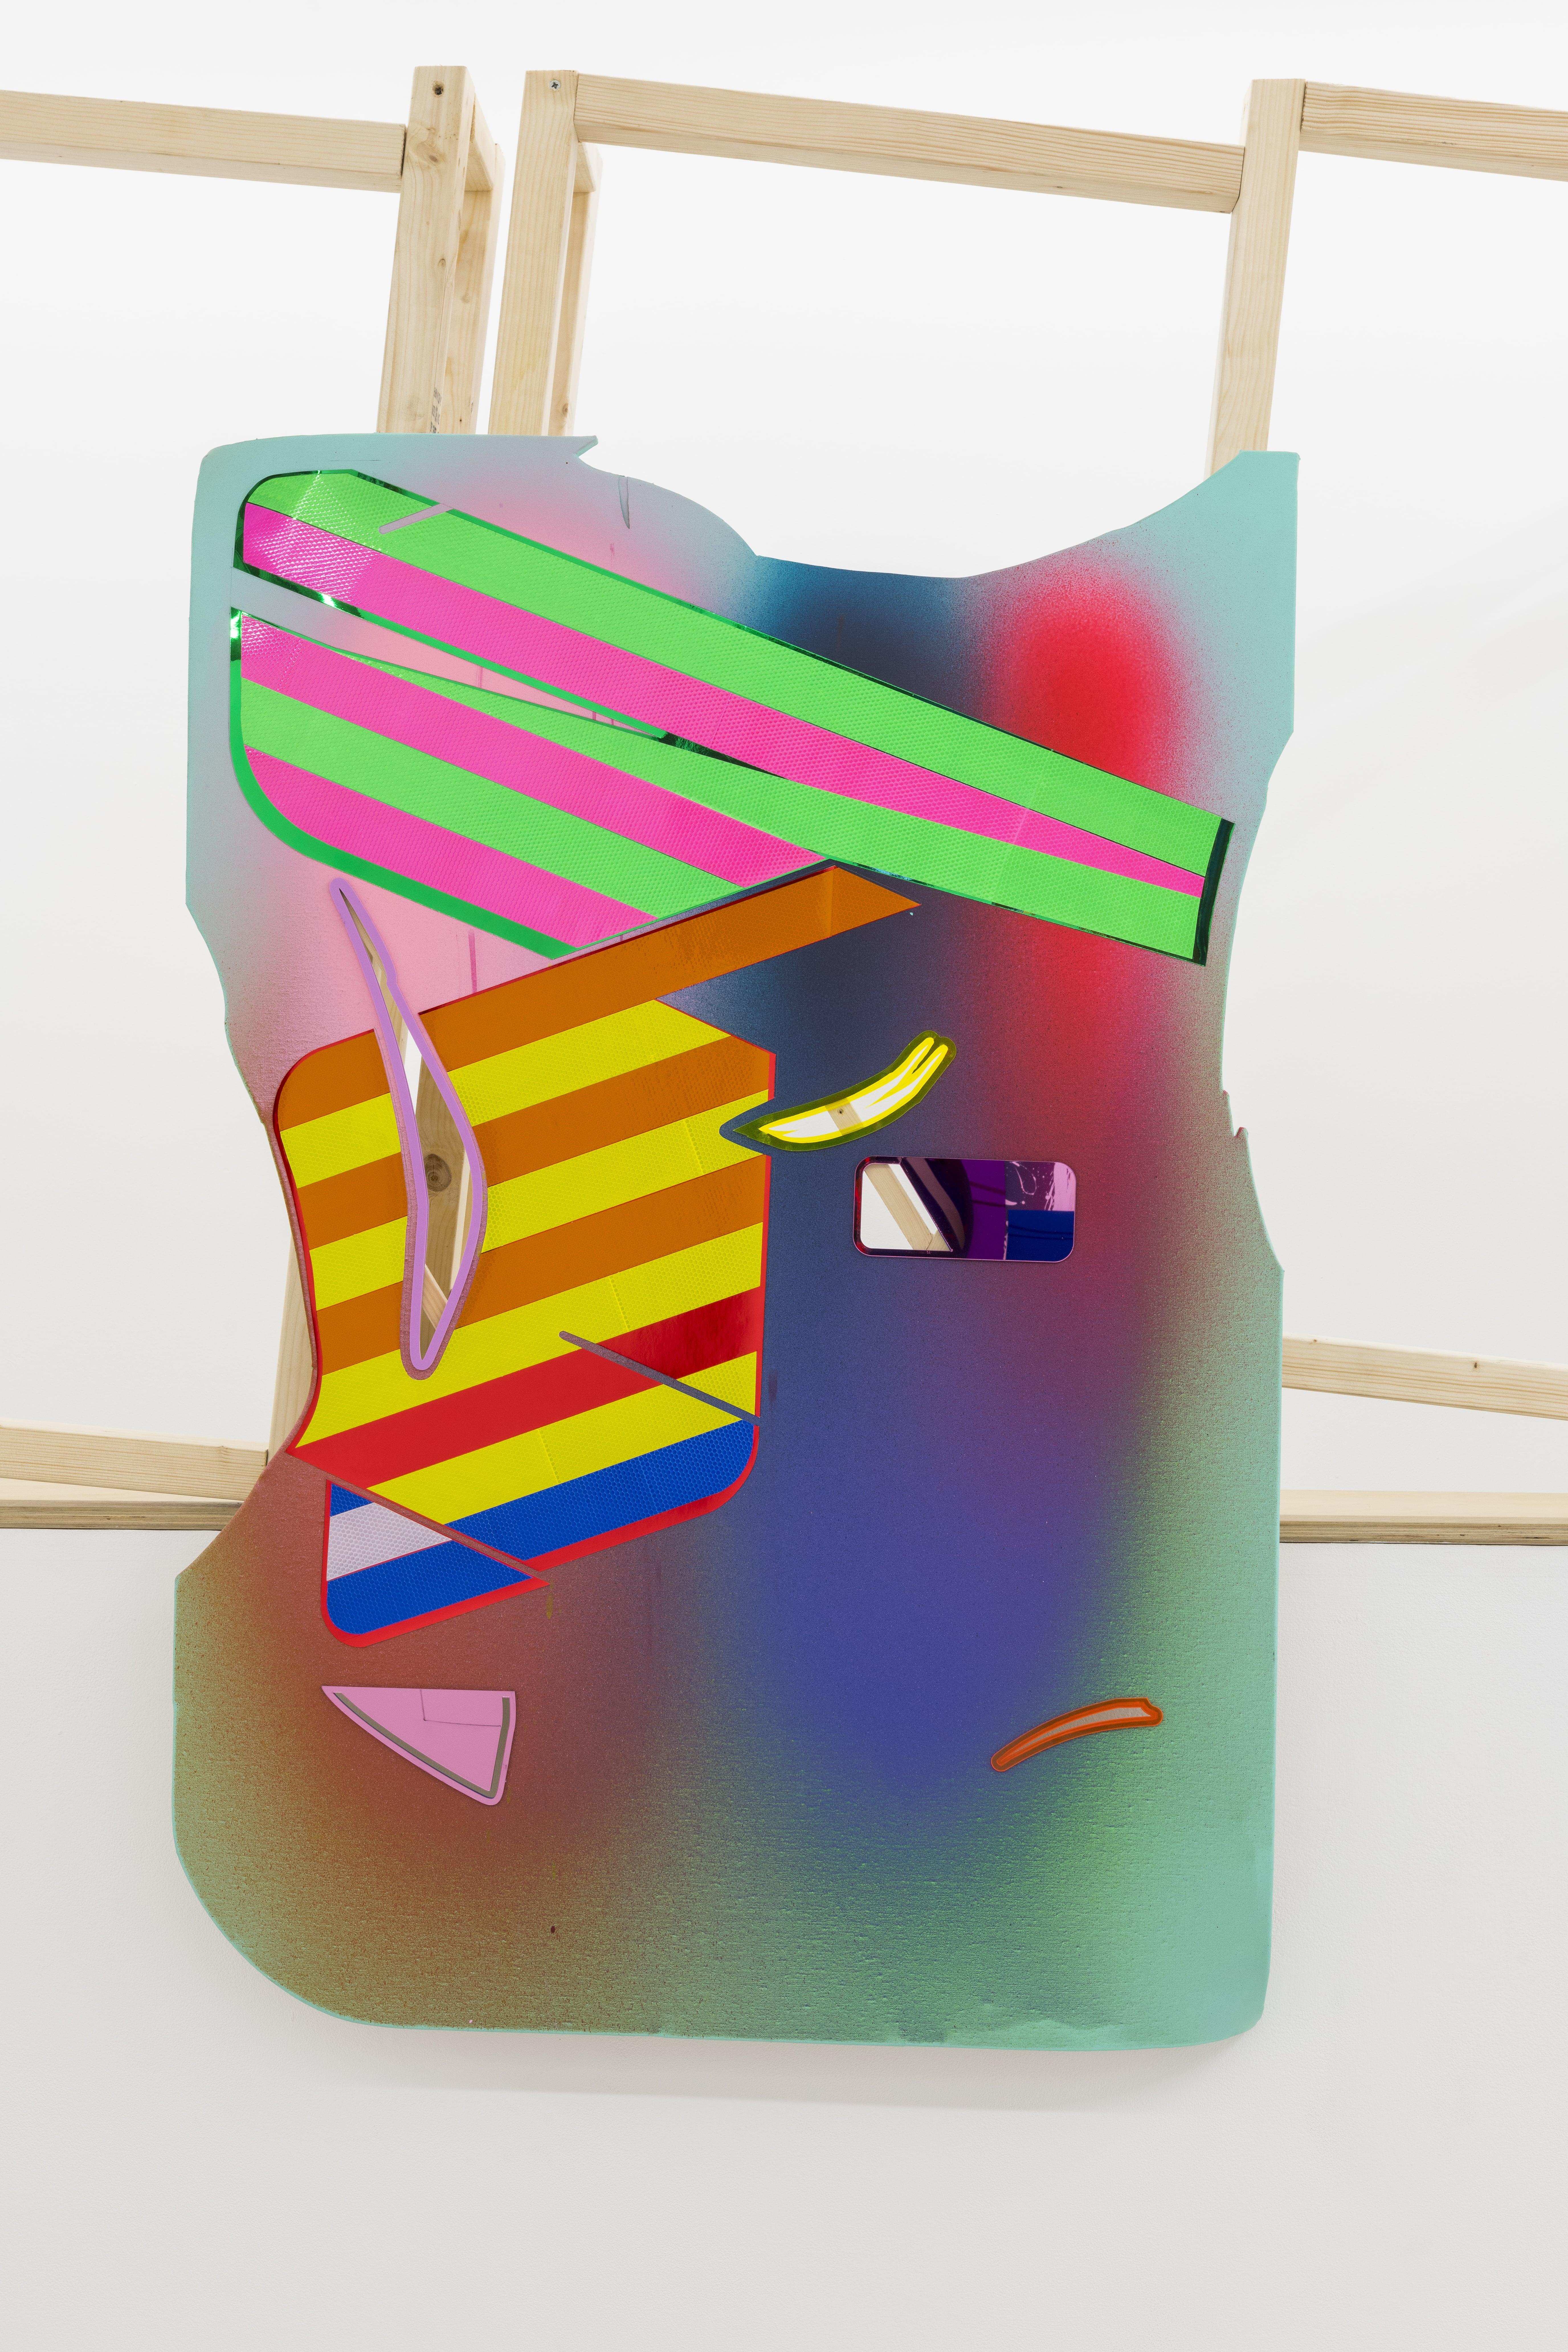 NemesM_Police-Paintings-05_2018_130x90cm_light-reflective-vinyl-mirror-paper-lasercut-perspex-acrylic-canvas-wood-min